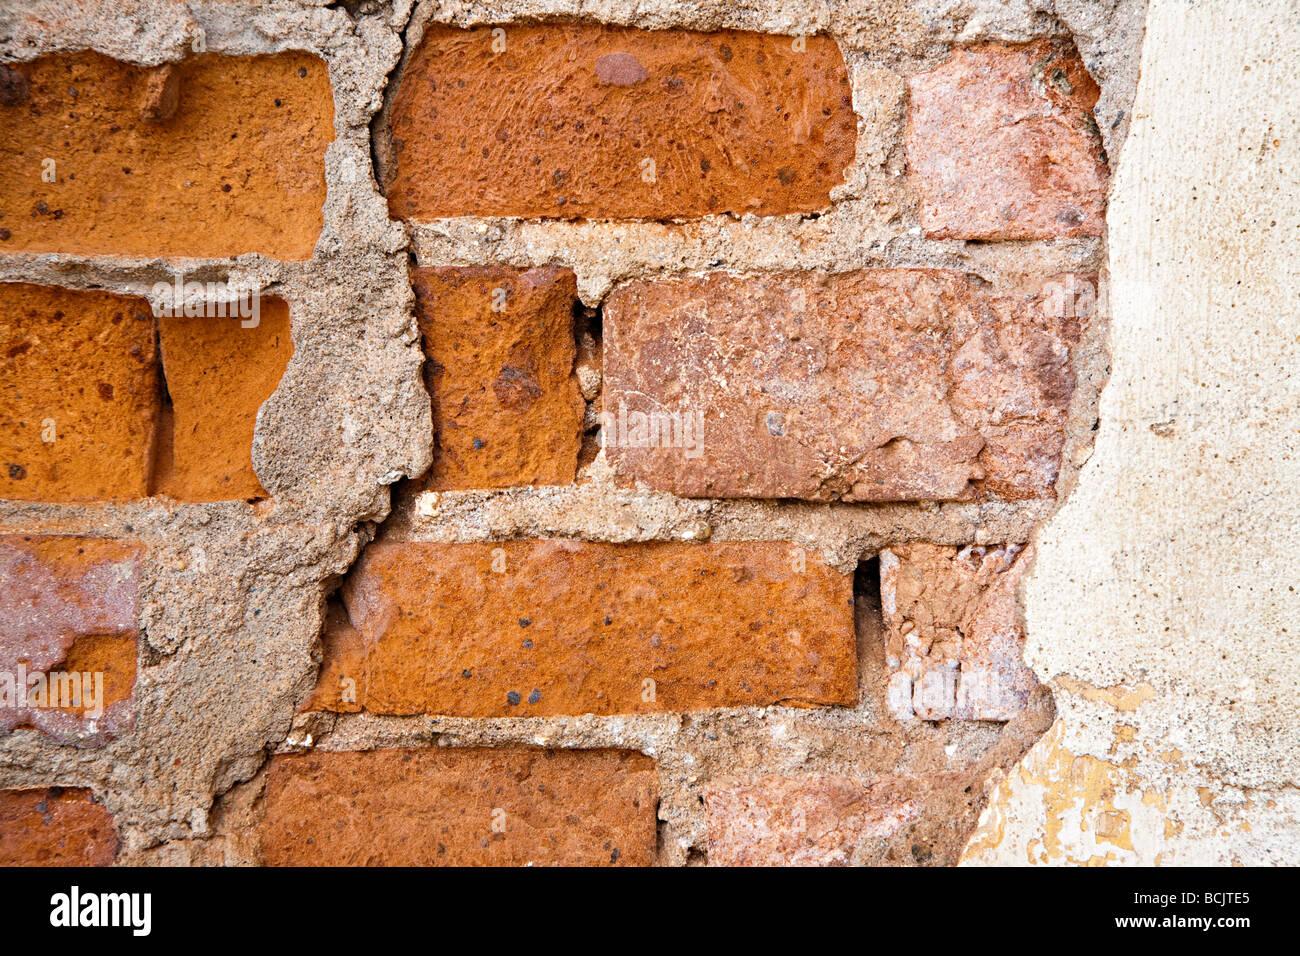 Close up of a broken wall - Stock Image